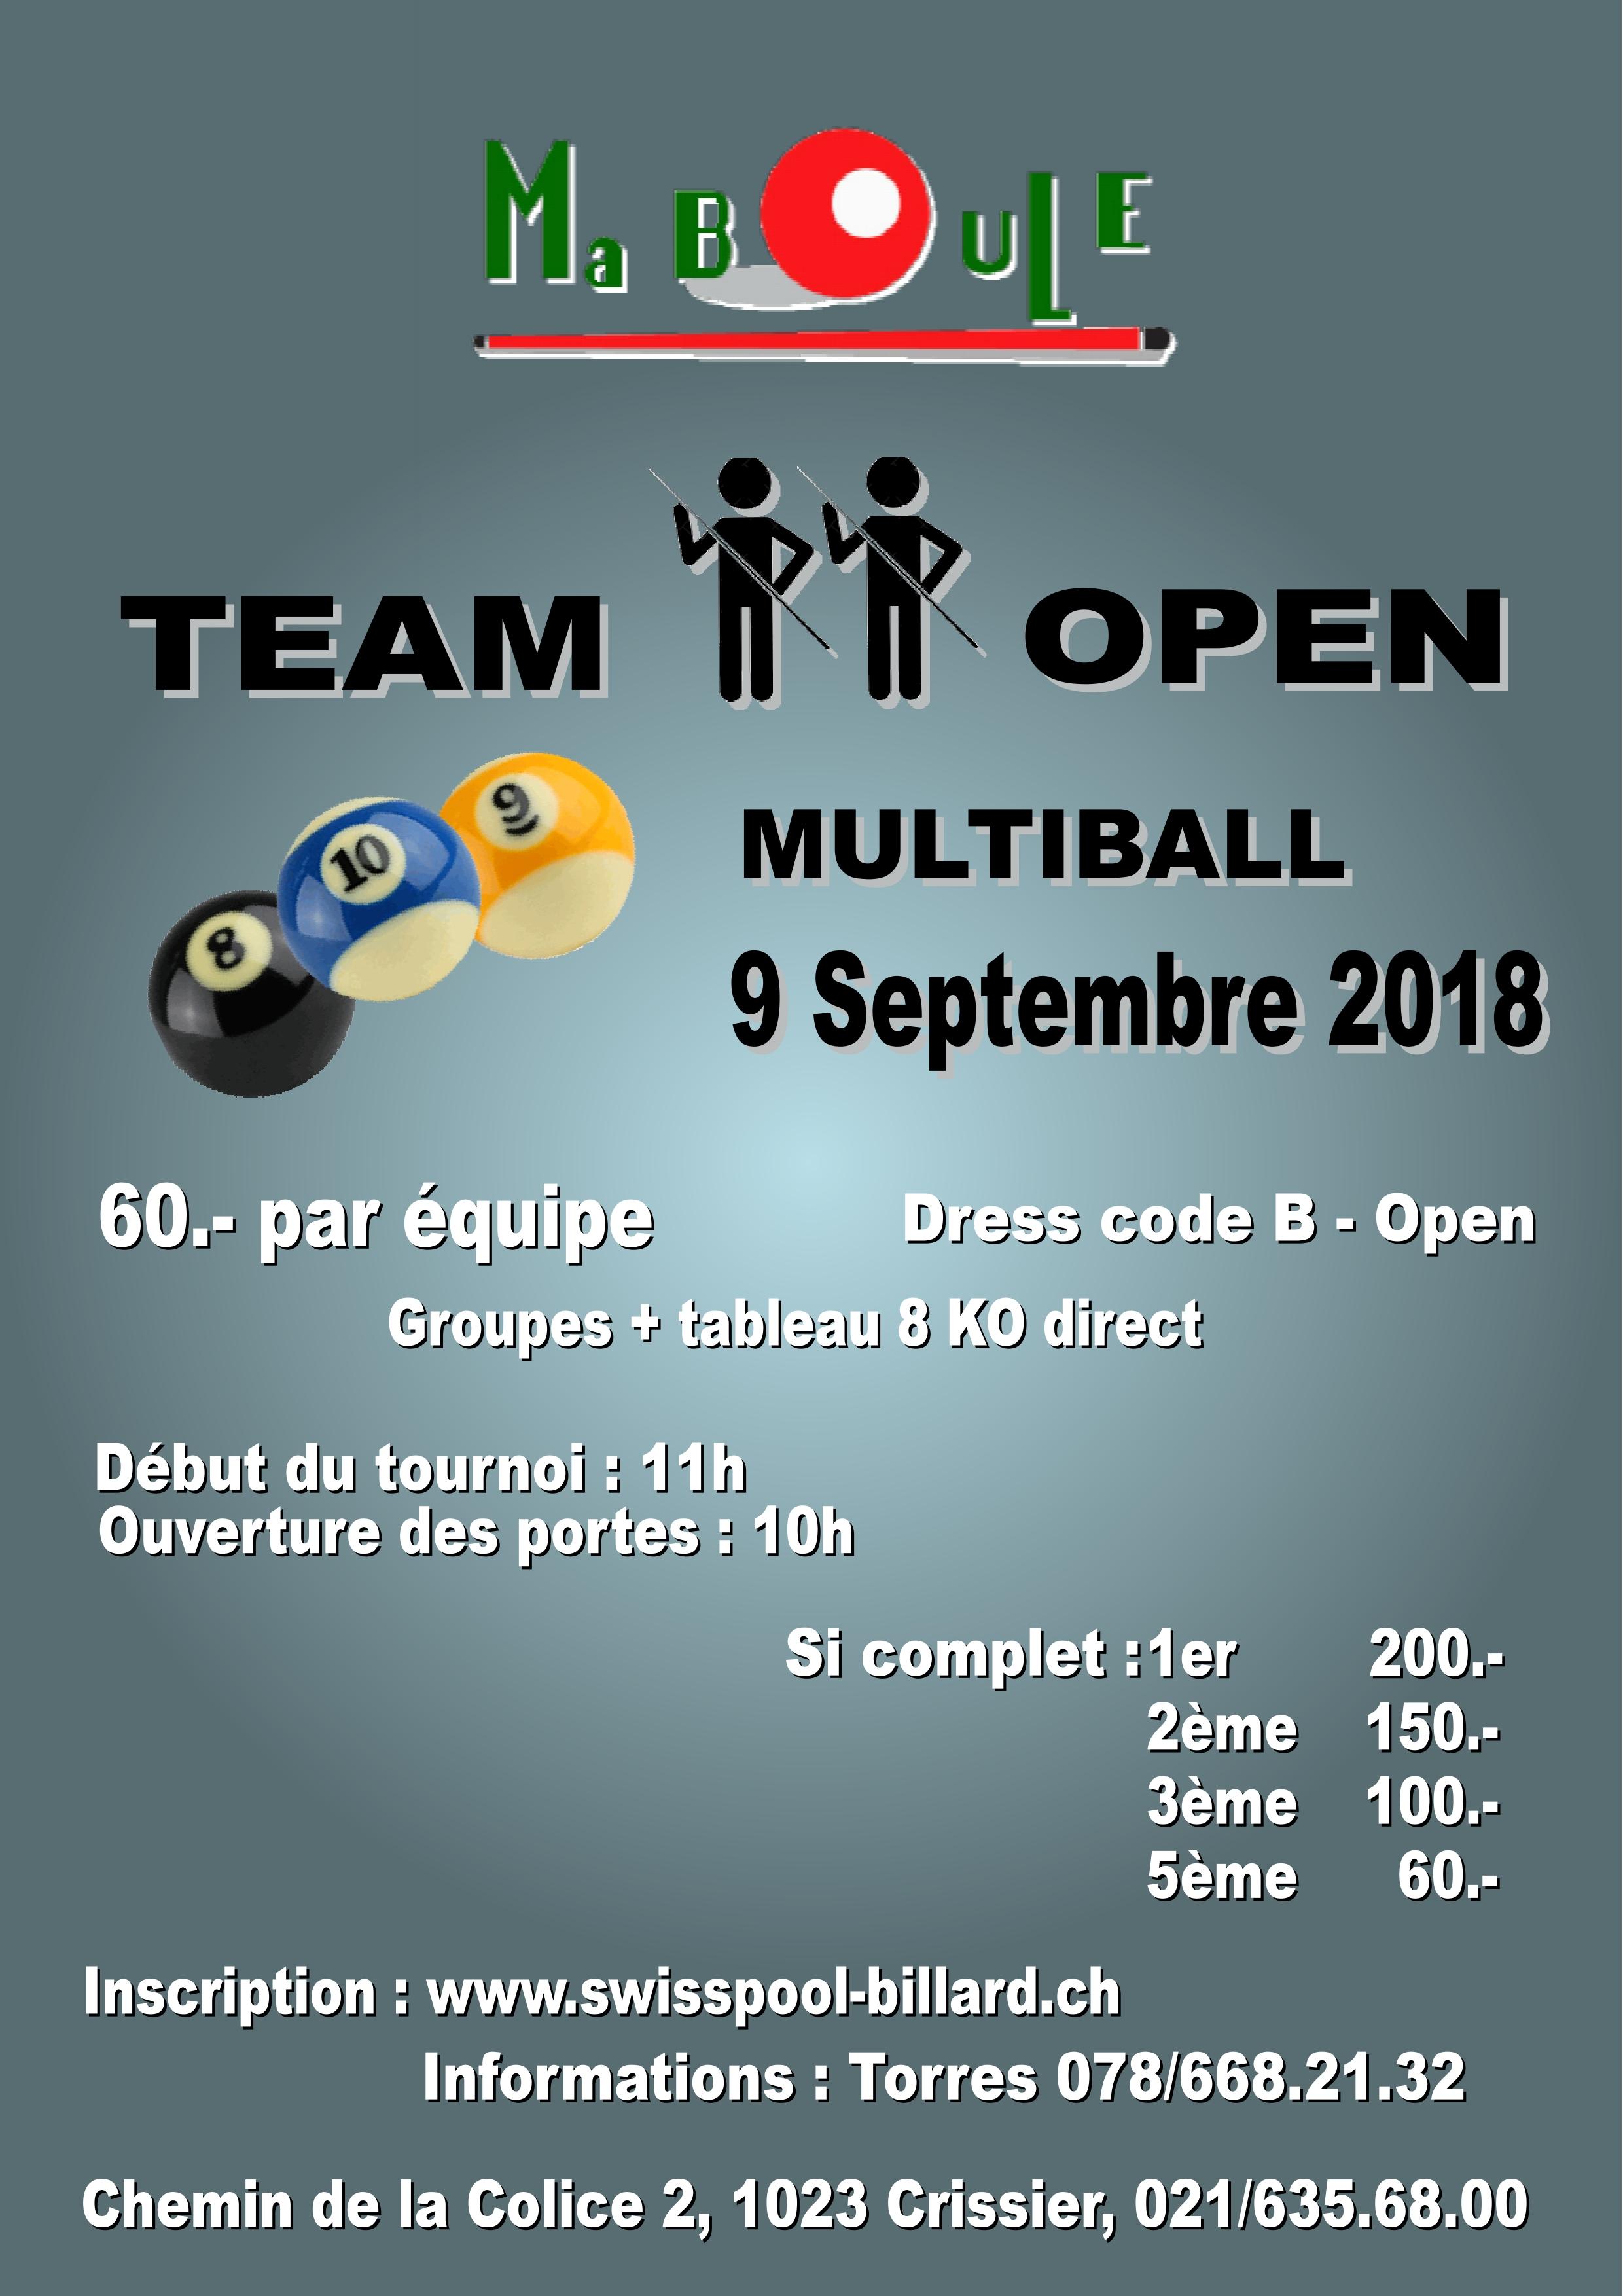 Affiche team open 9 septembre 2018 déf.2 (1).jpg